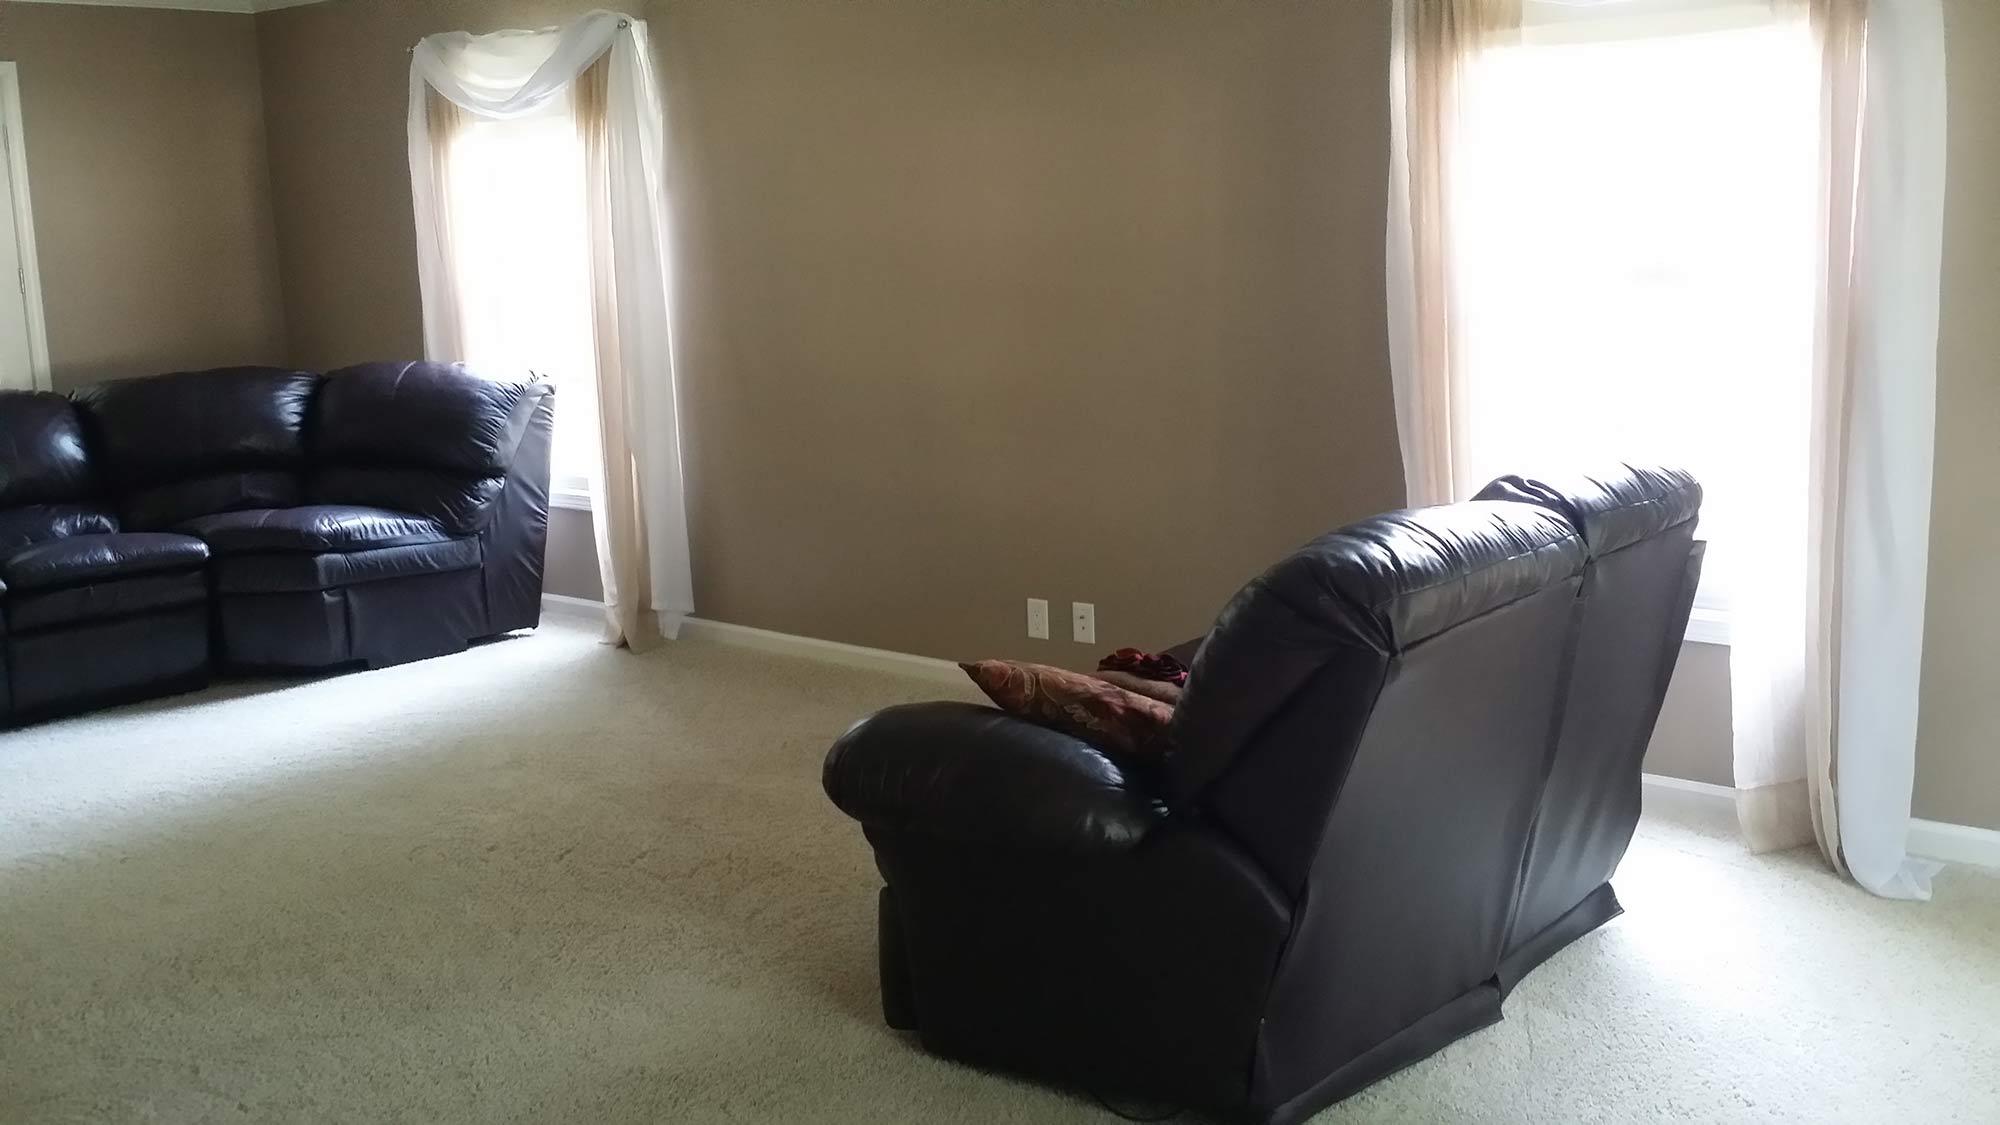 Woodridge living room before staging